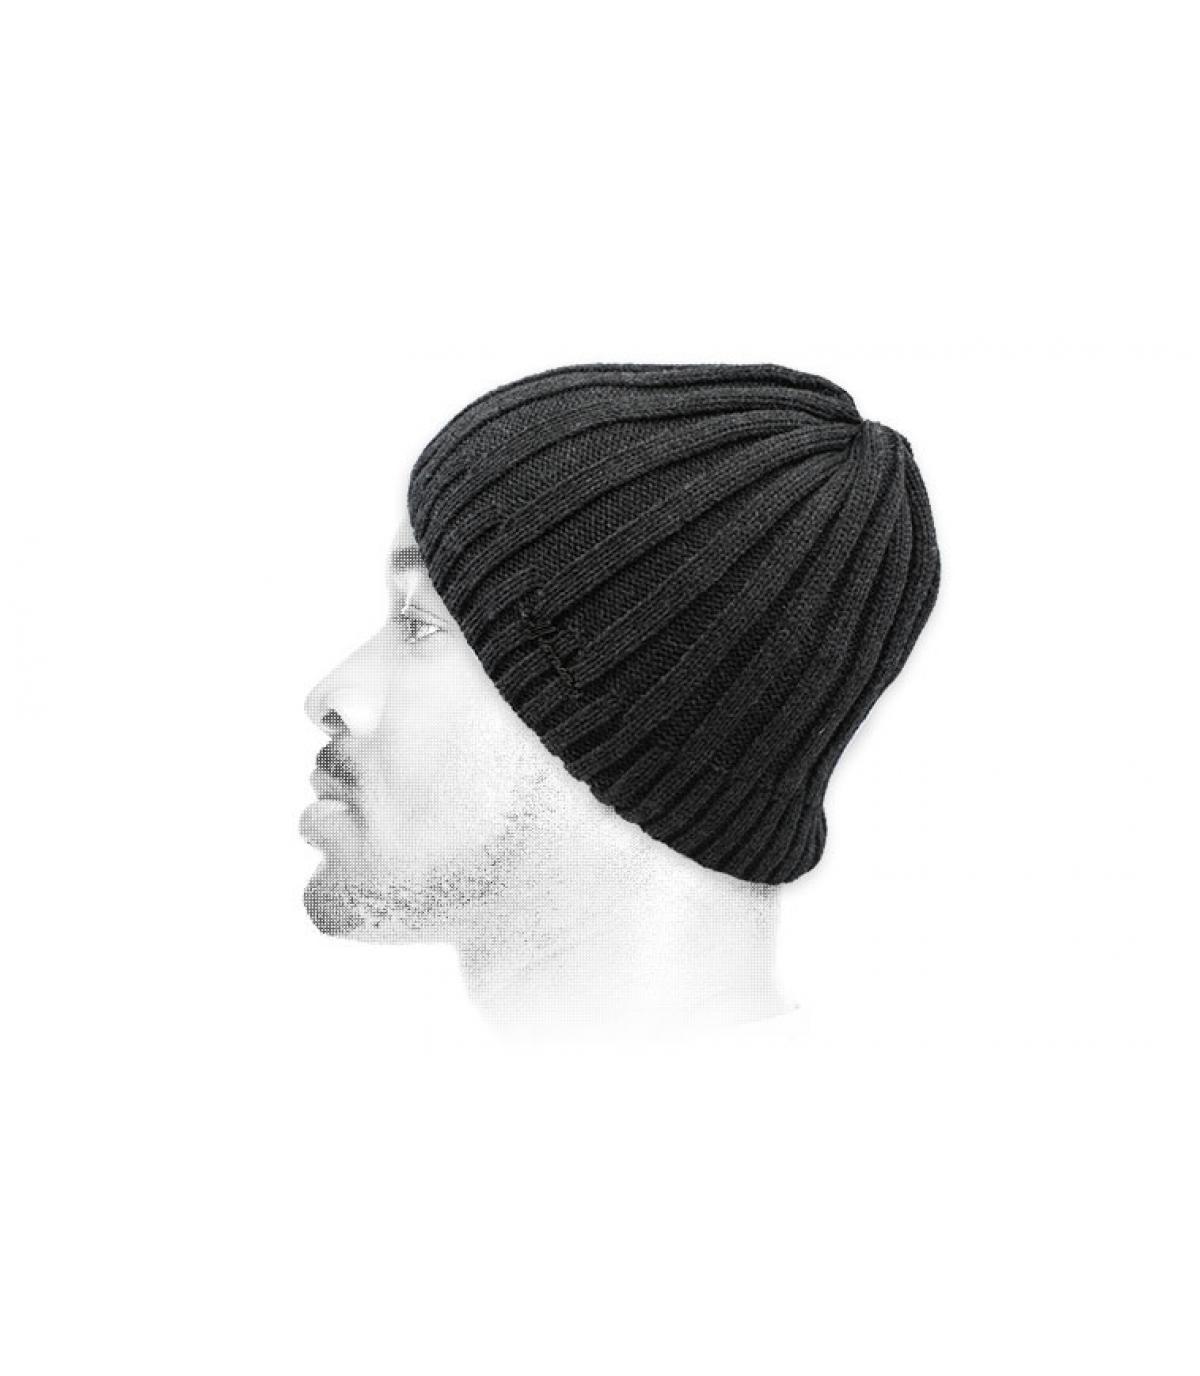 grijze korte hoed